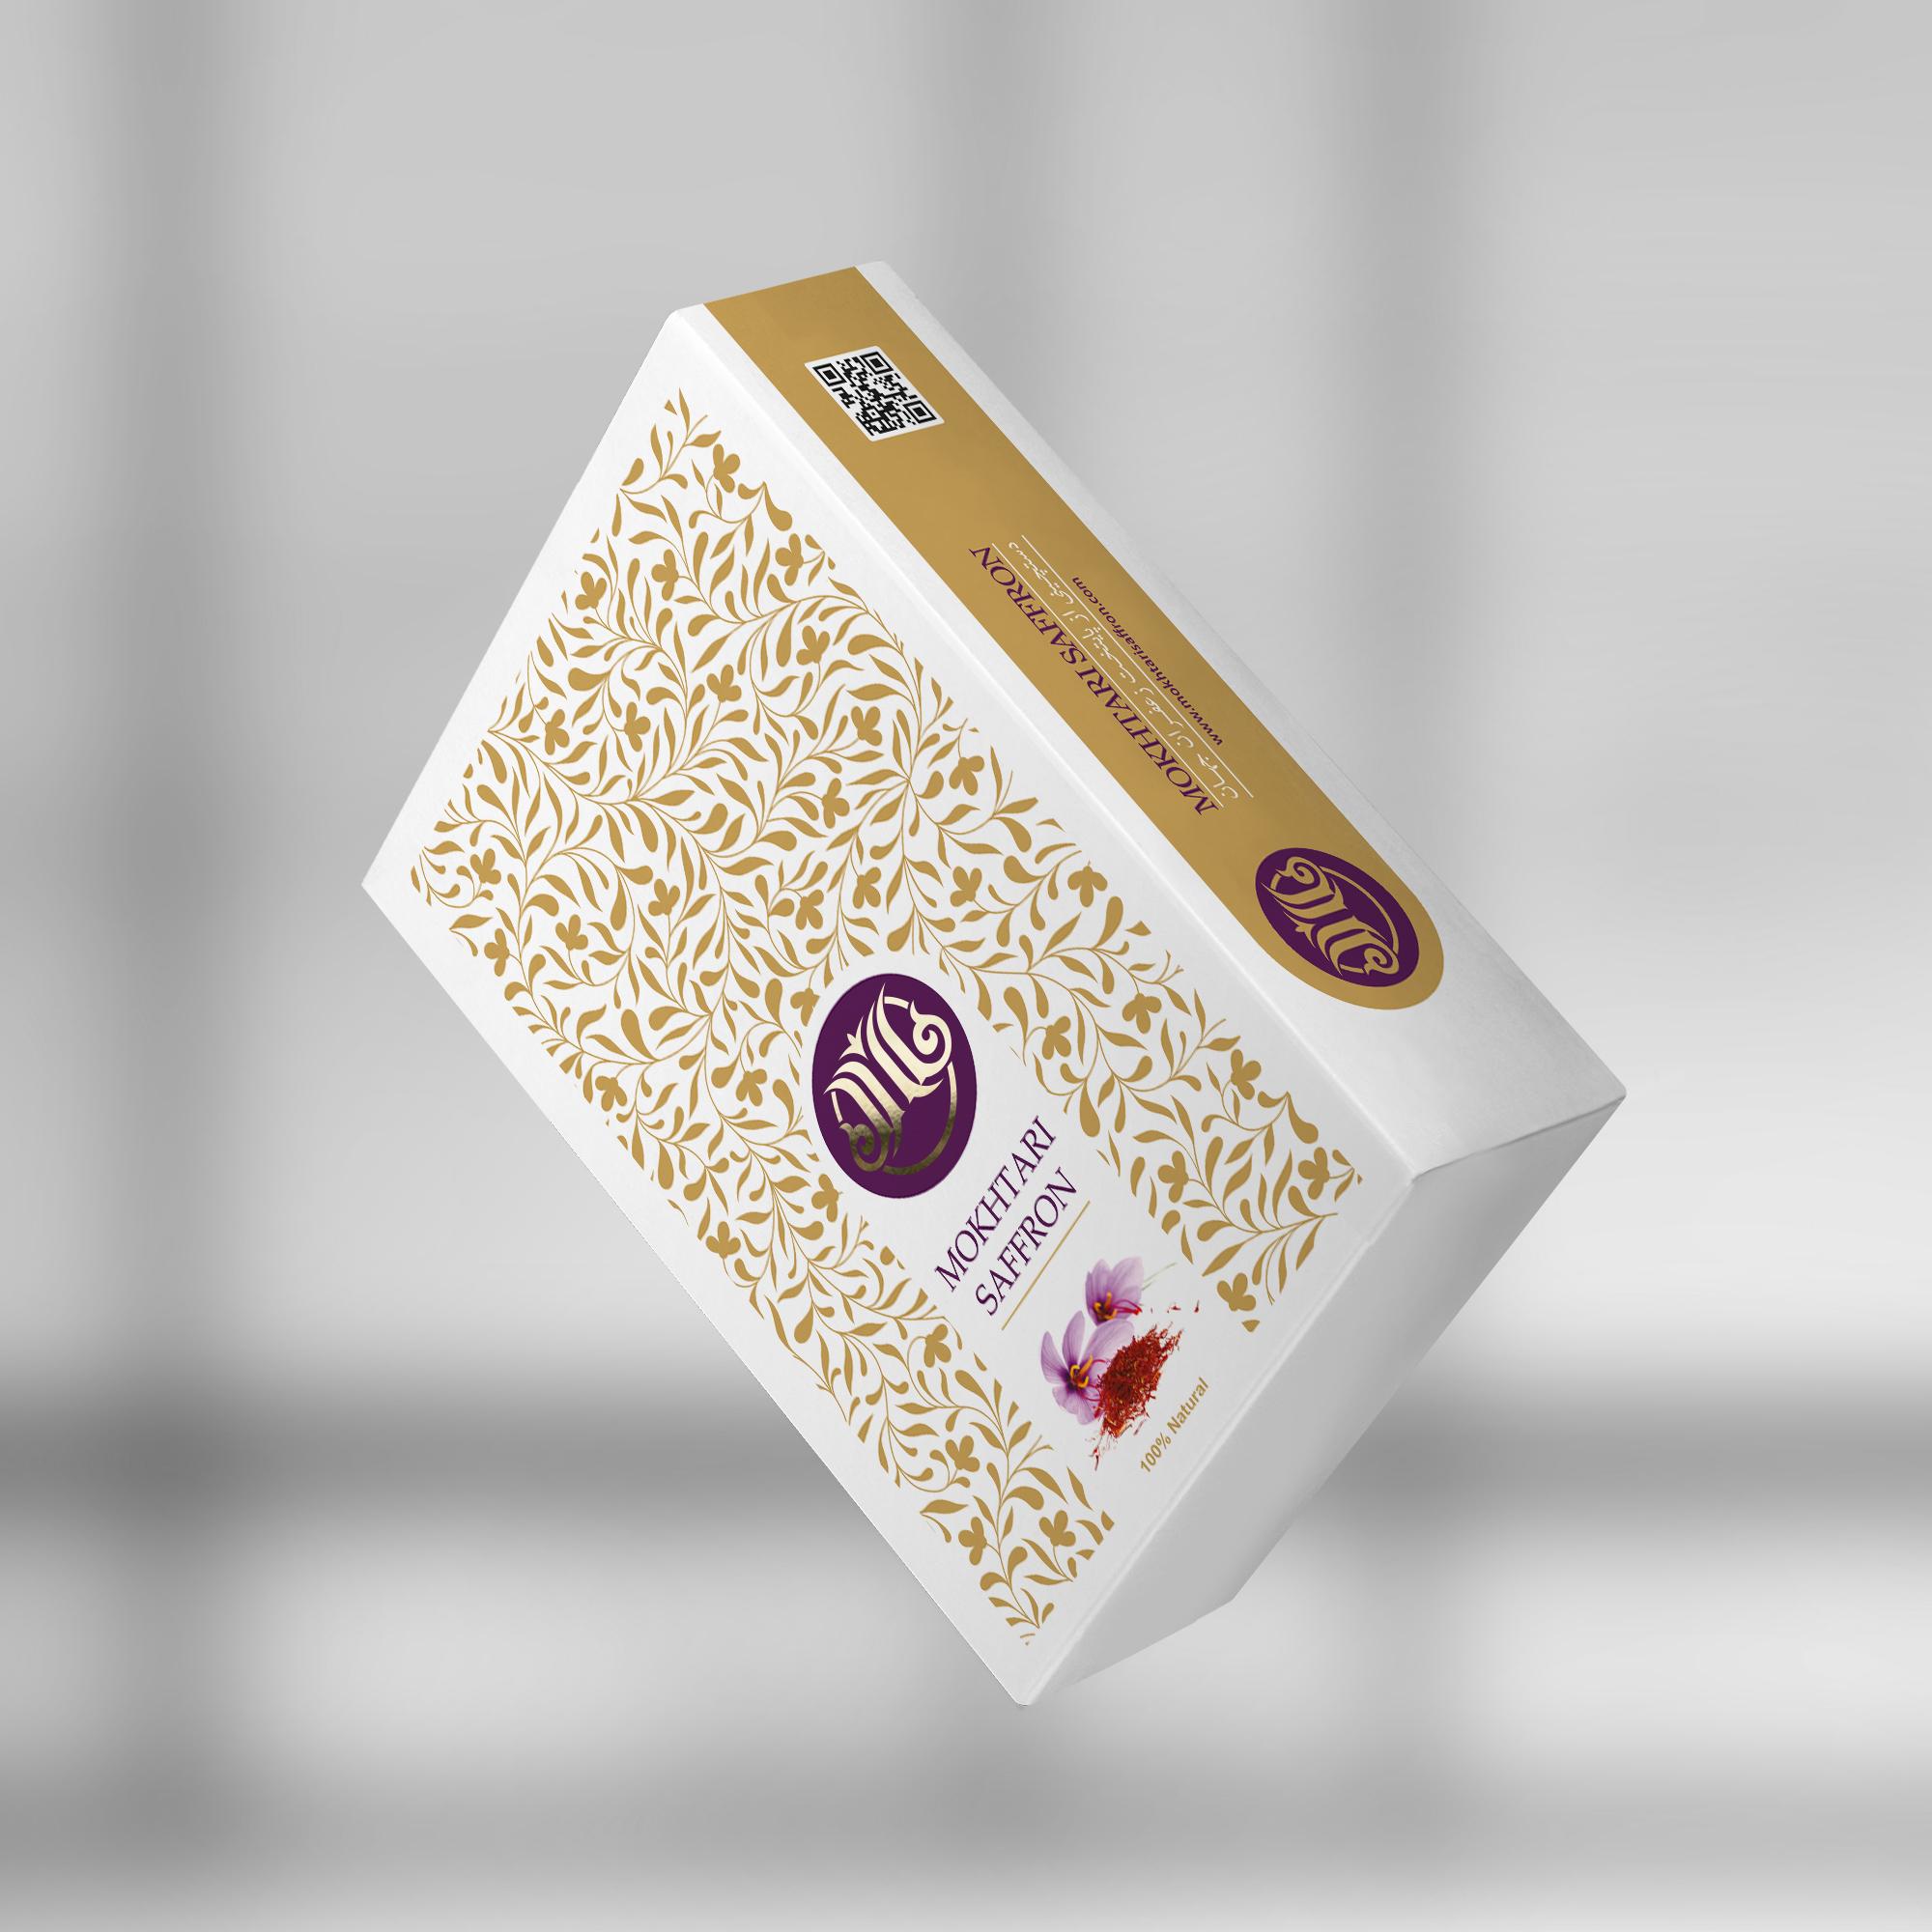 Packaging For Mokhtari Saffron